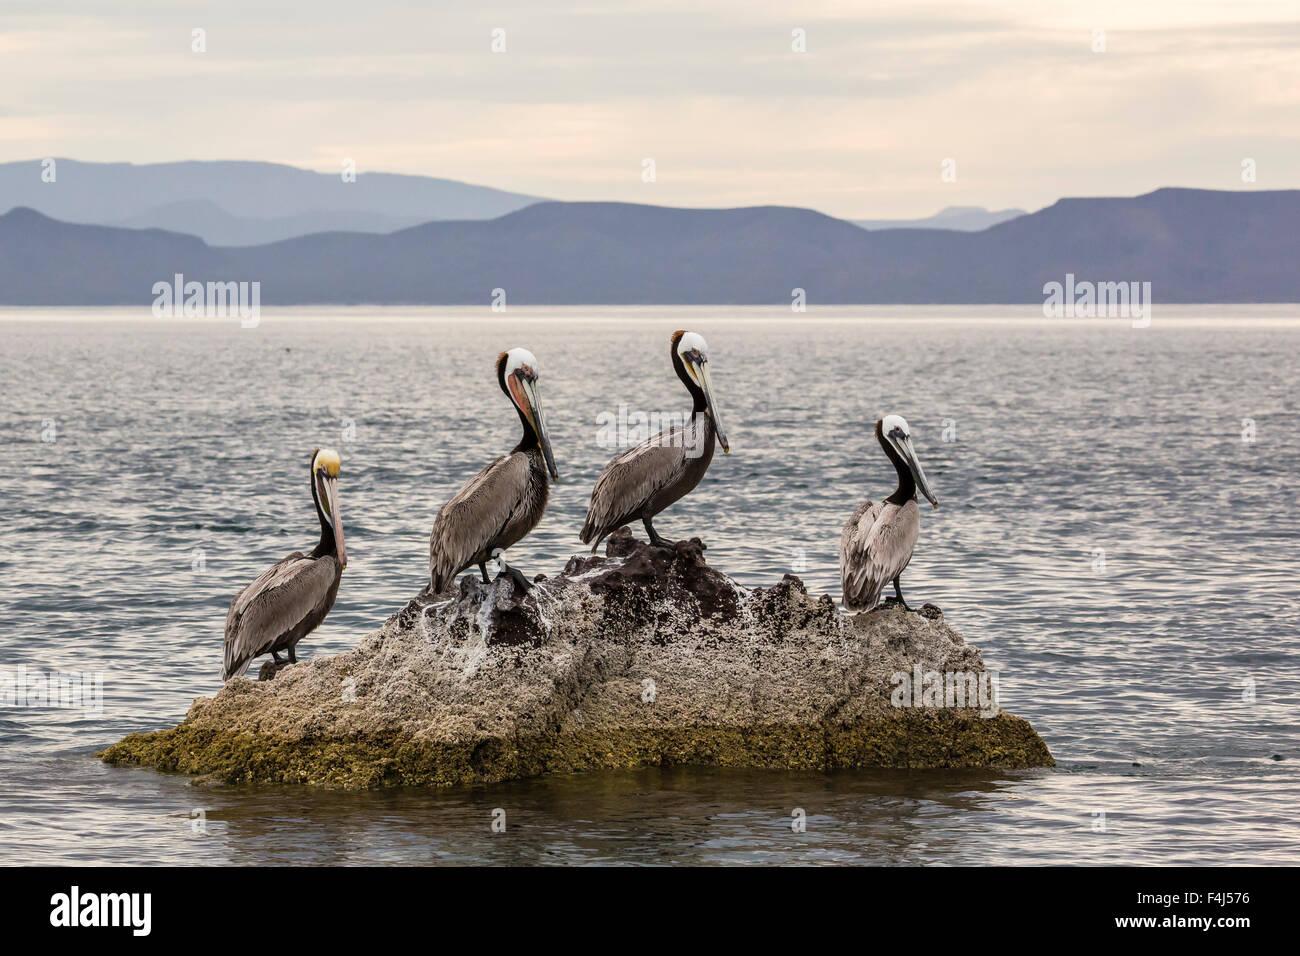 Erwachsenen braune Pelikane (Pelecanus Occidentalis), Isla Ildefonso, Baja California Sur, Mexiko, Nordamerika Stockfoto